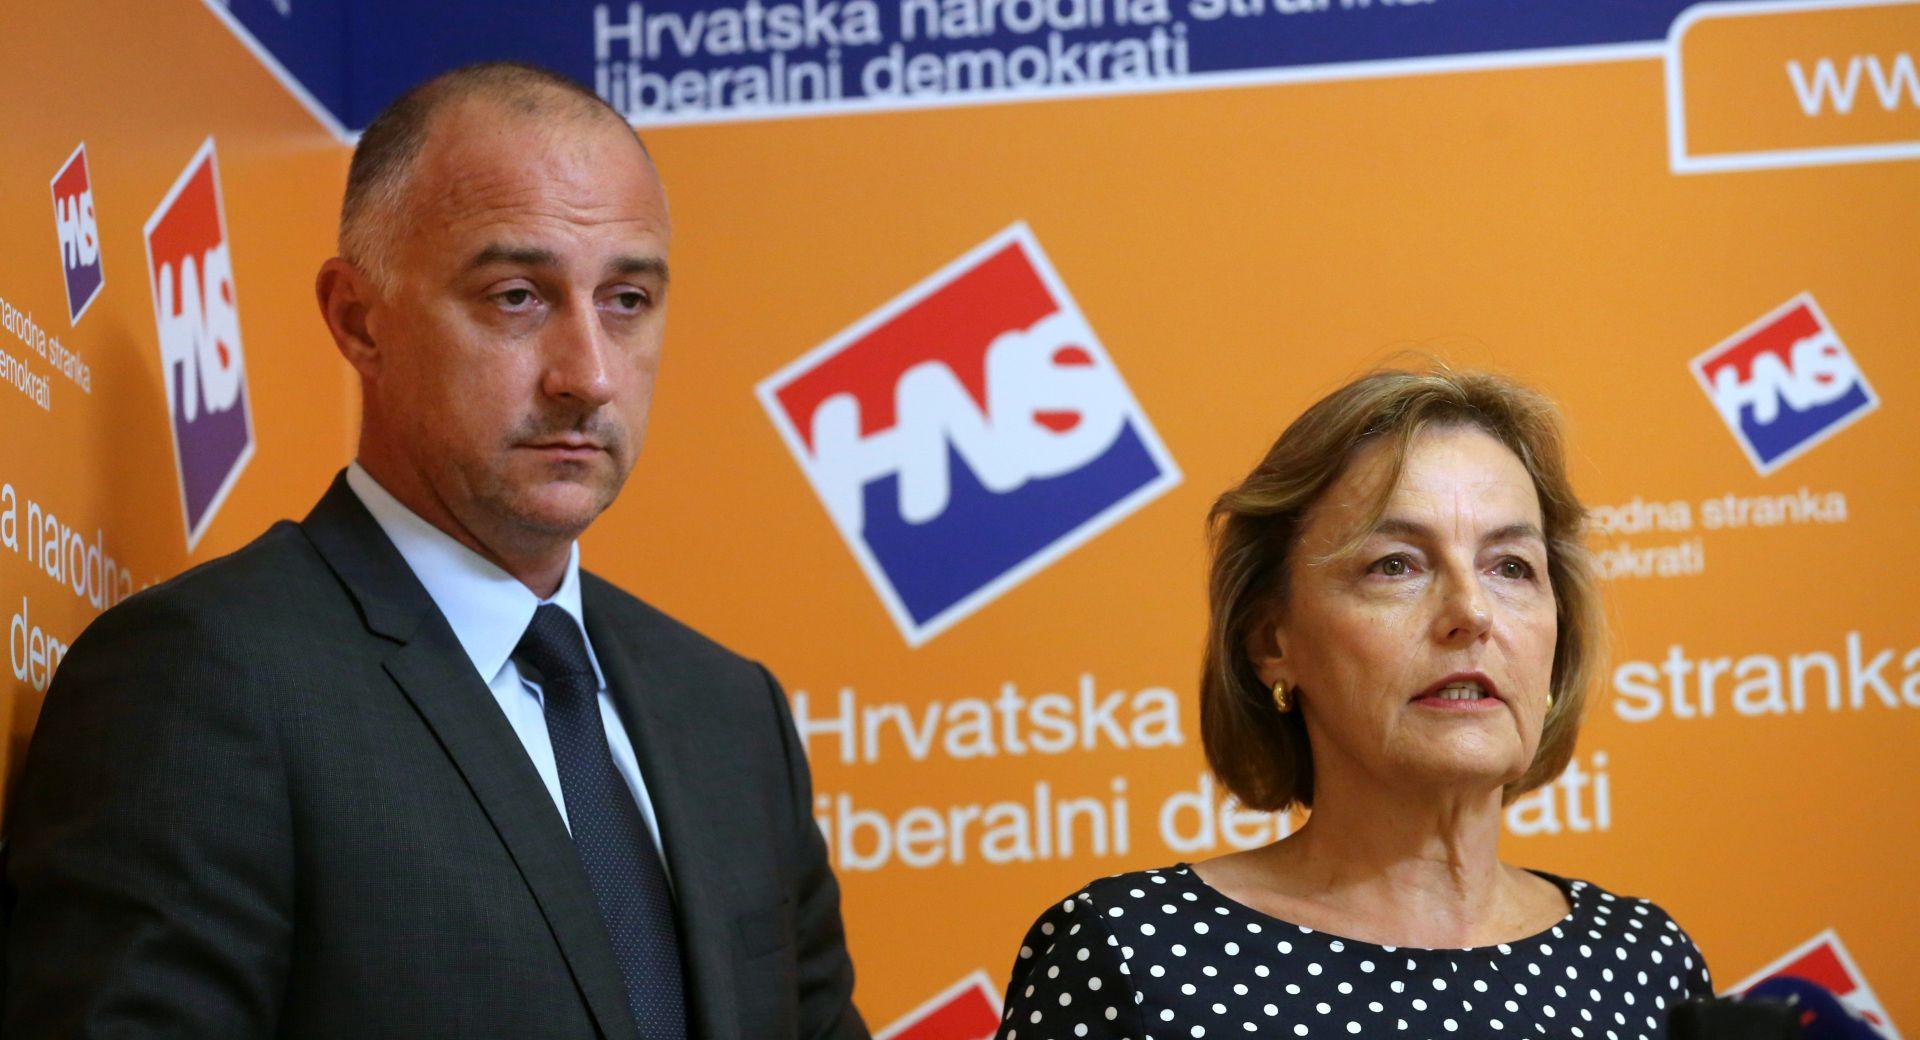 HNS OSUDIO GLAS KONCILA: Zatraženo očitovanje pravobraniteljice za ravnopravnost spolova